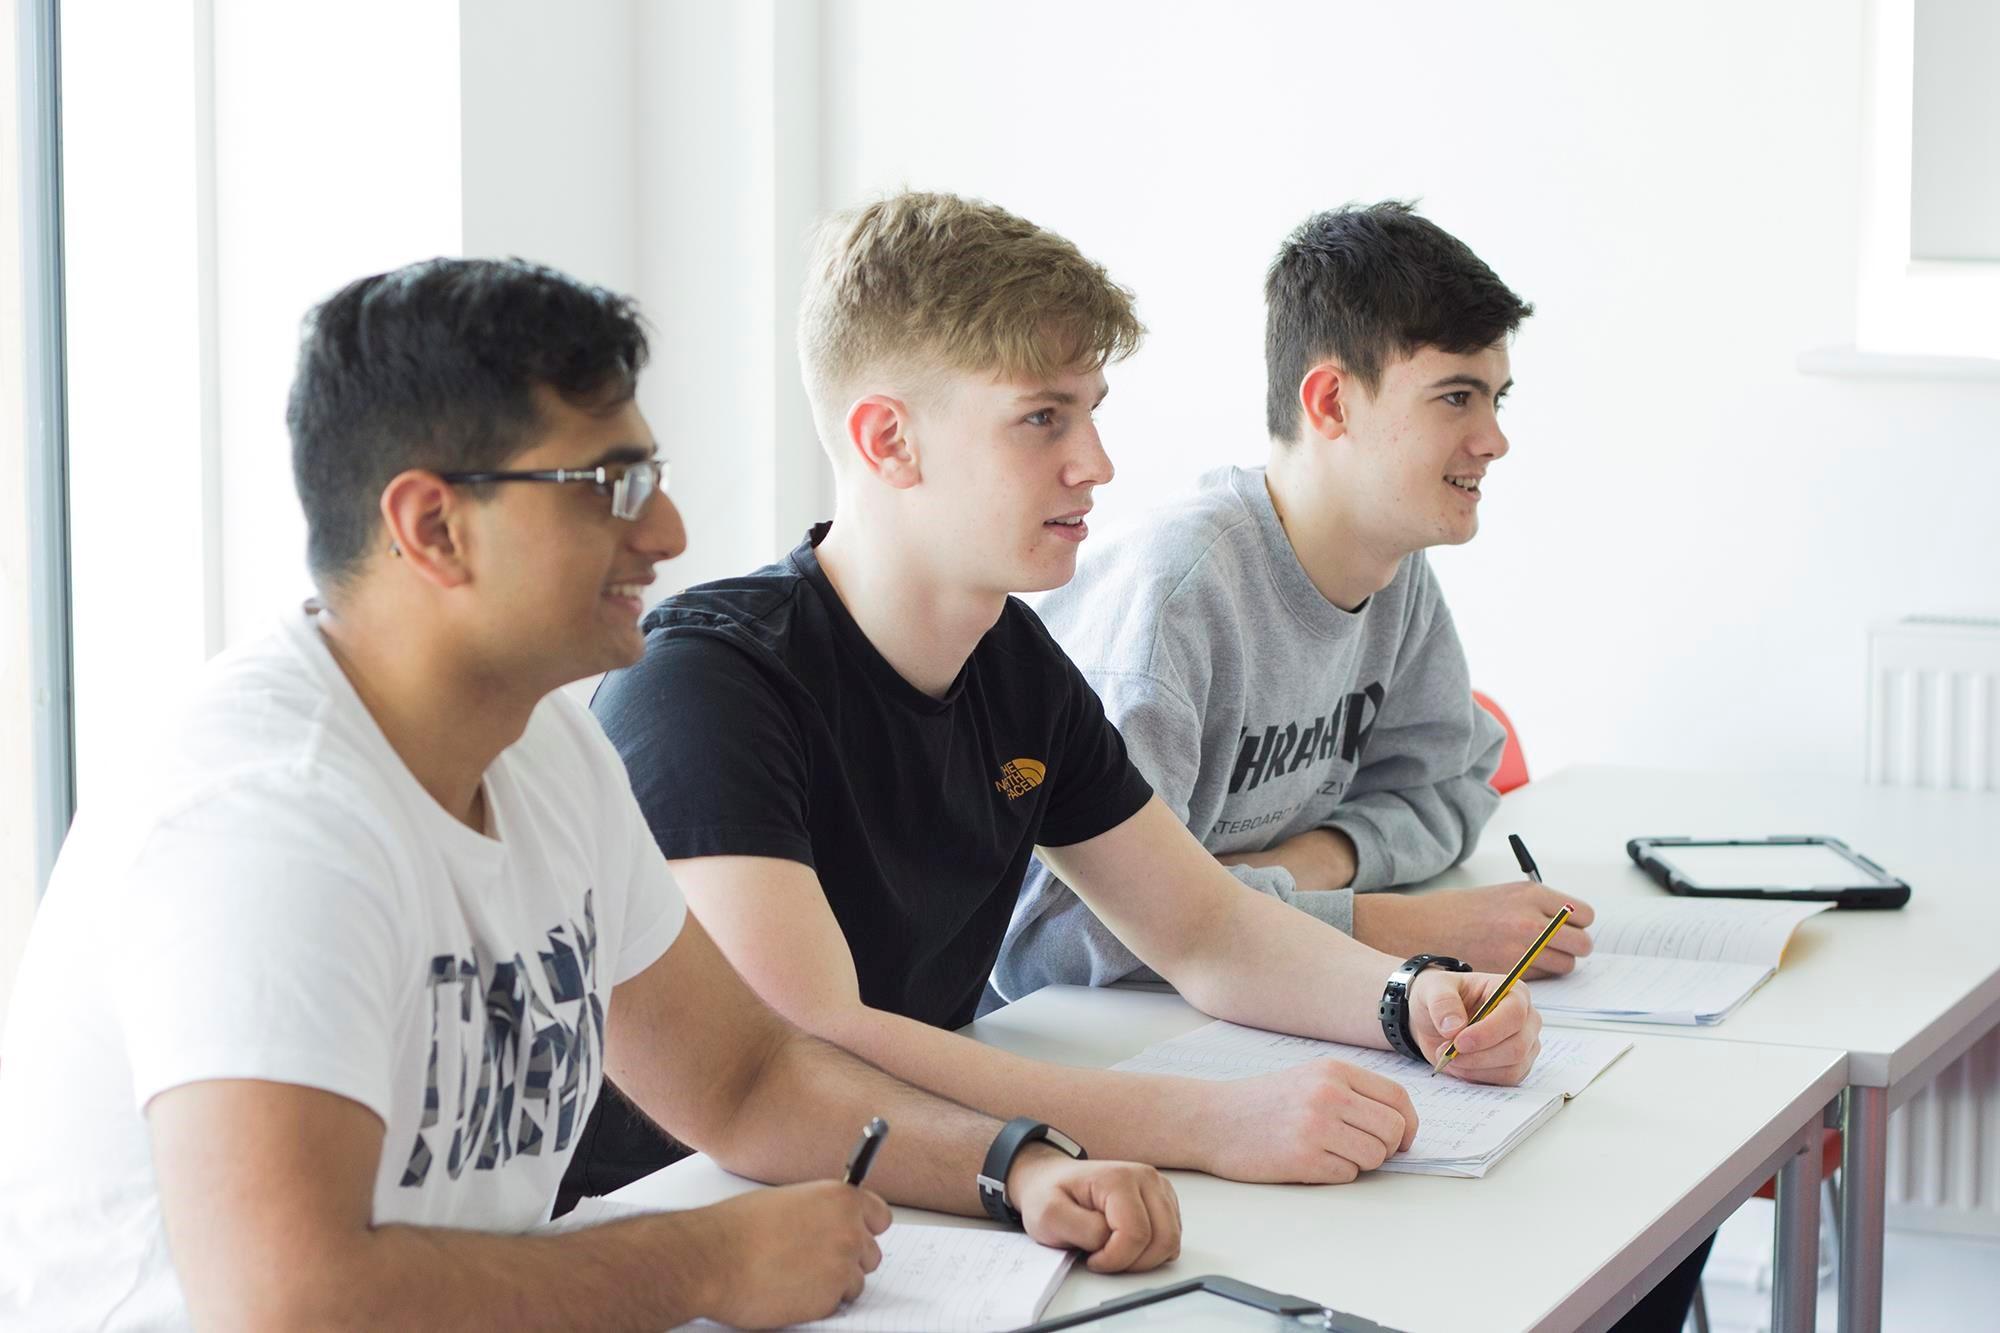 Futura Sixth Students Academic